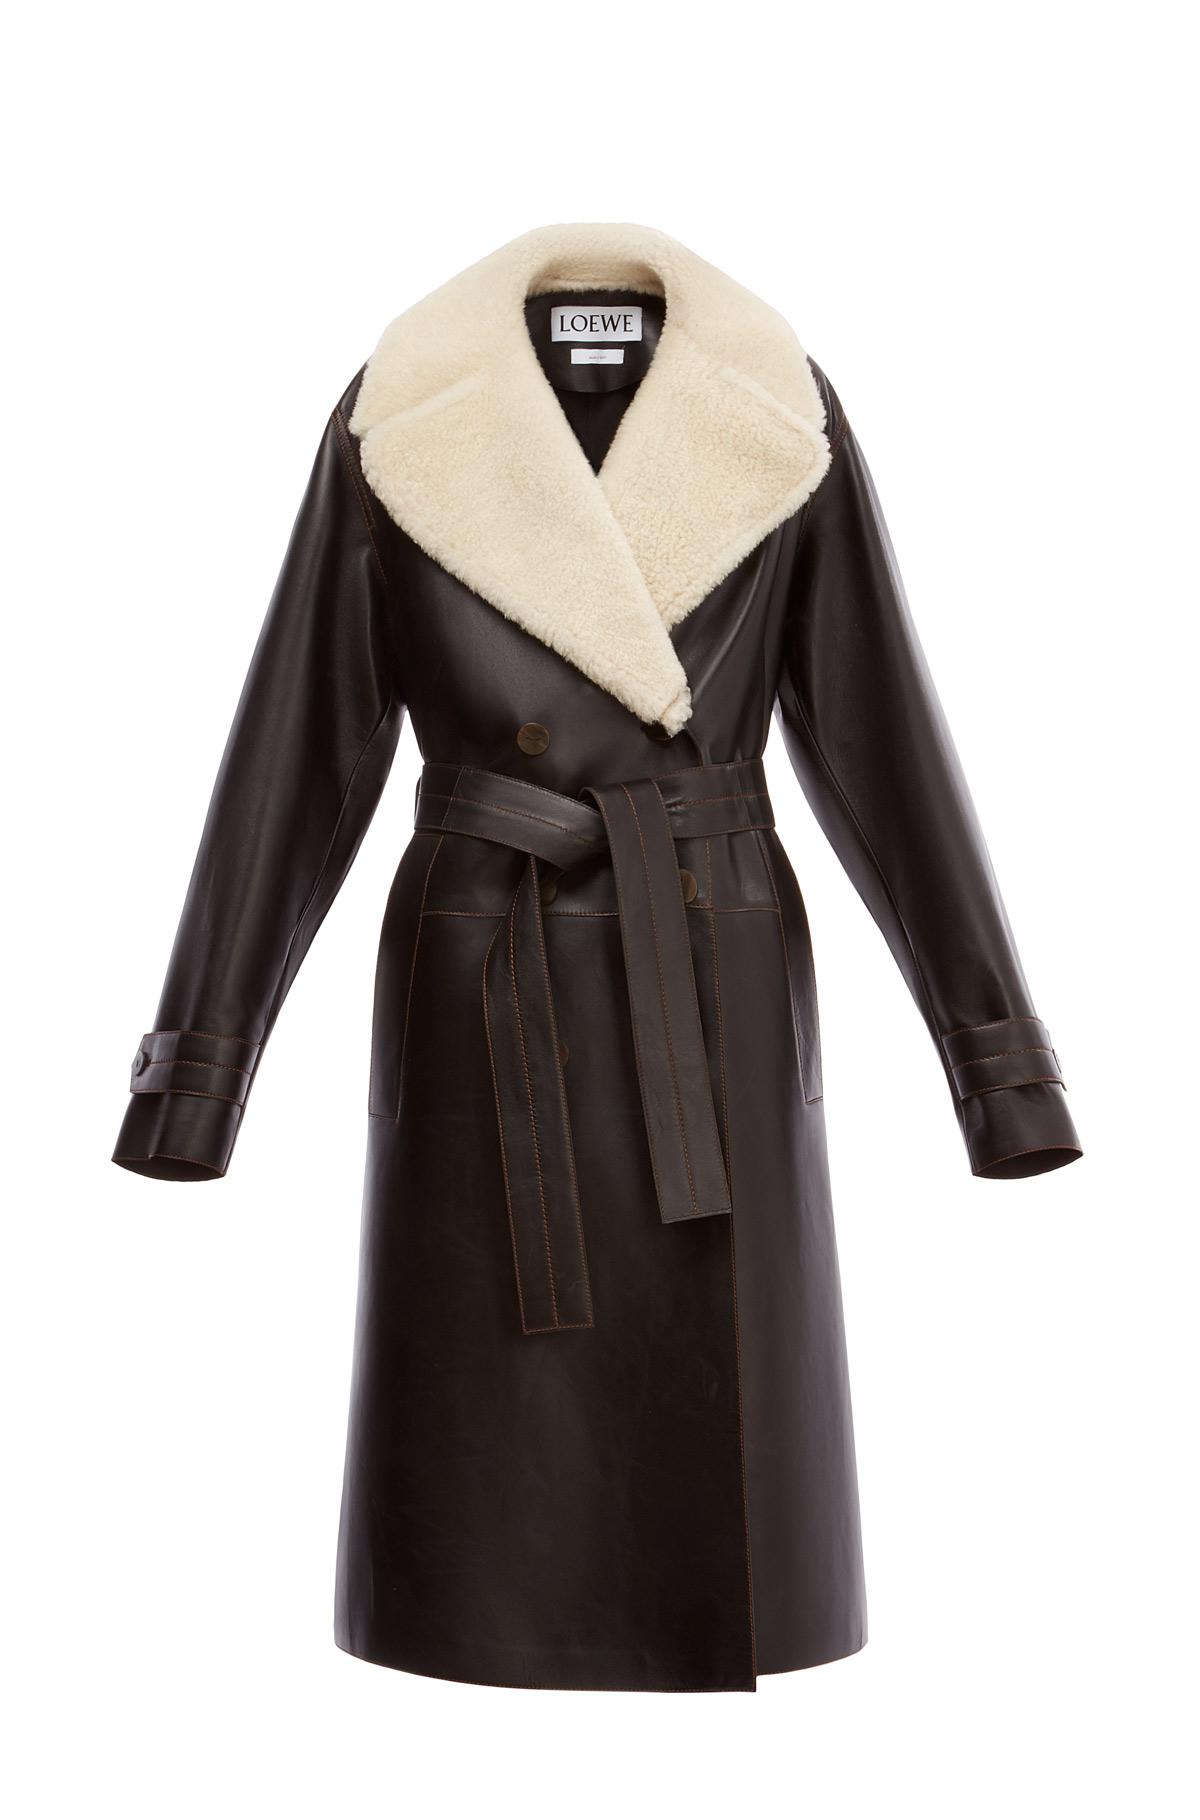 LOEWE Belted Coat Shearling Collar Black/Natural front